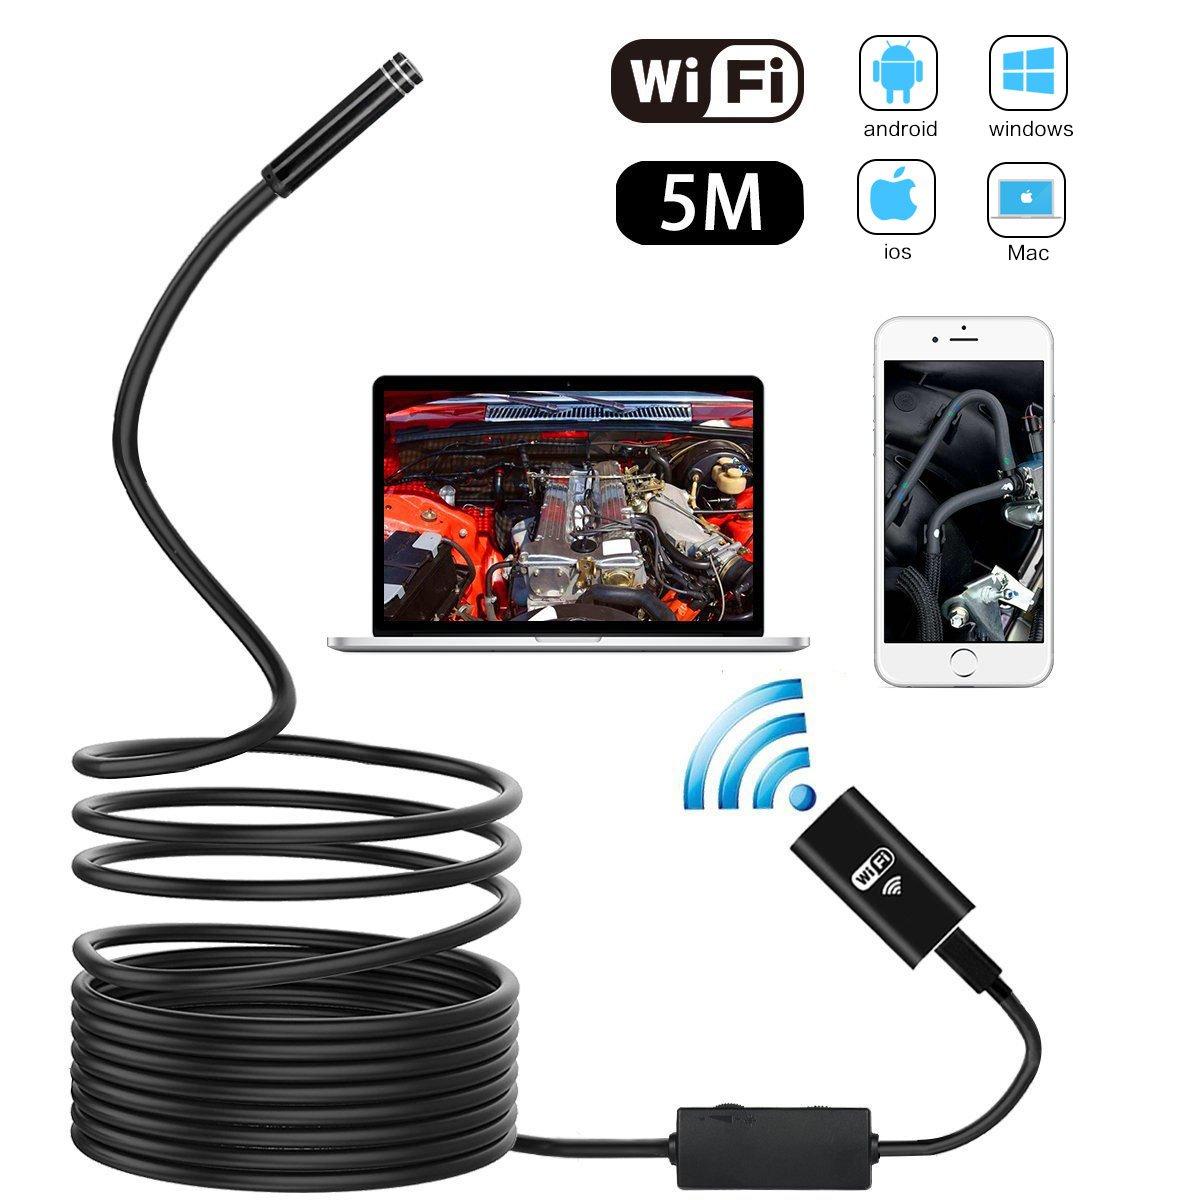 Metalbay Endoscopio HD WIFI 5M Impermeabile Macchina Fotografica di Ispezione 8 LED Luci 2.0 Megapixels IP67 per IOS Smartphone , iPhone, Samsung, Tablet 151231